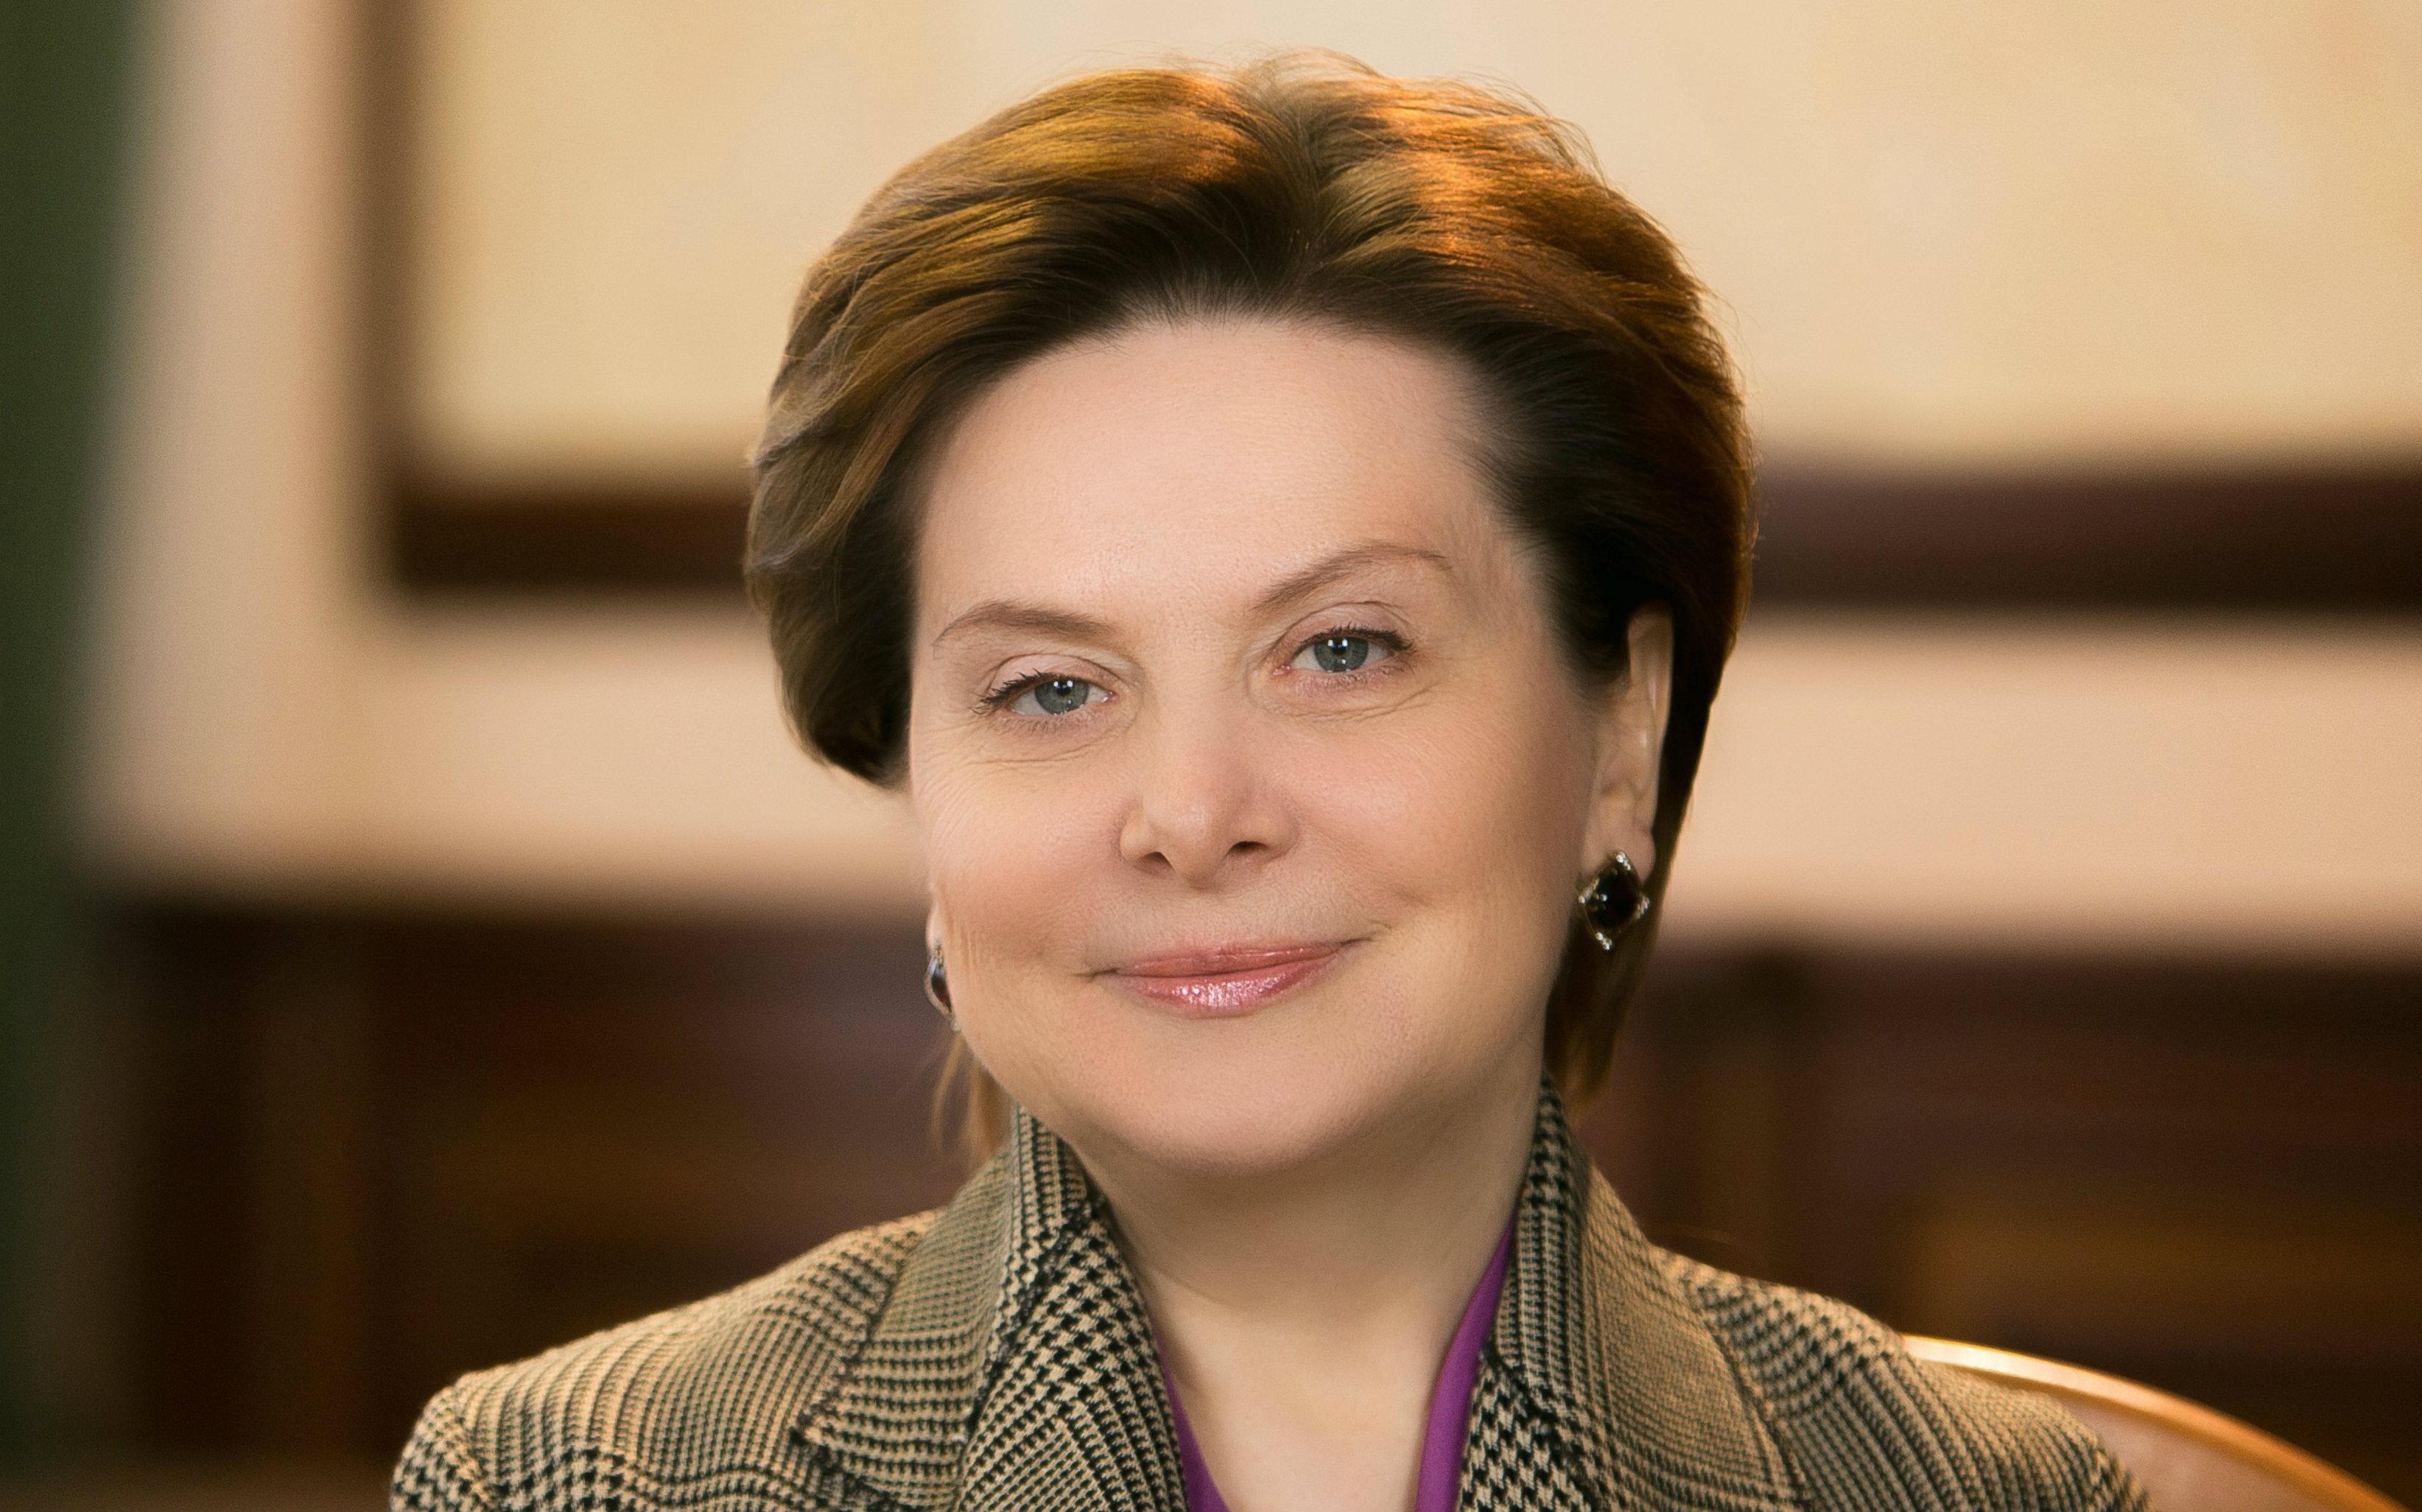 Губернатором ХМАО избрана Наталья Комарова